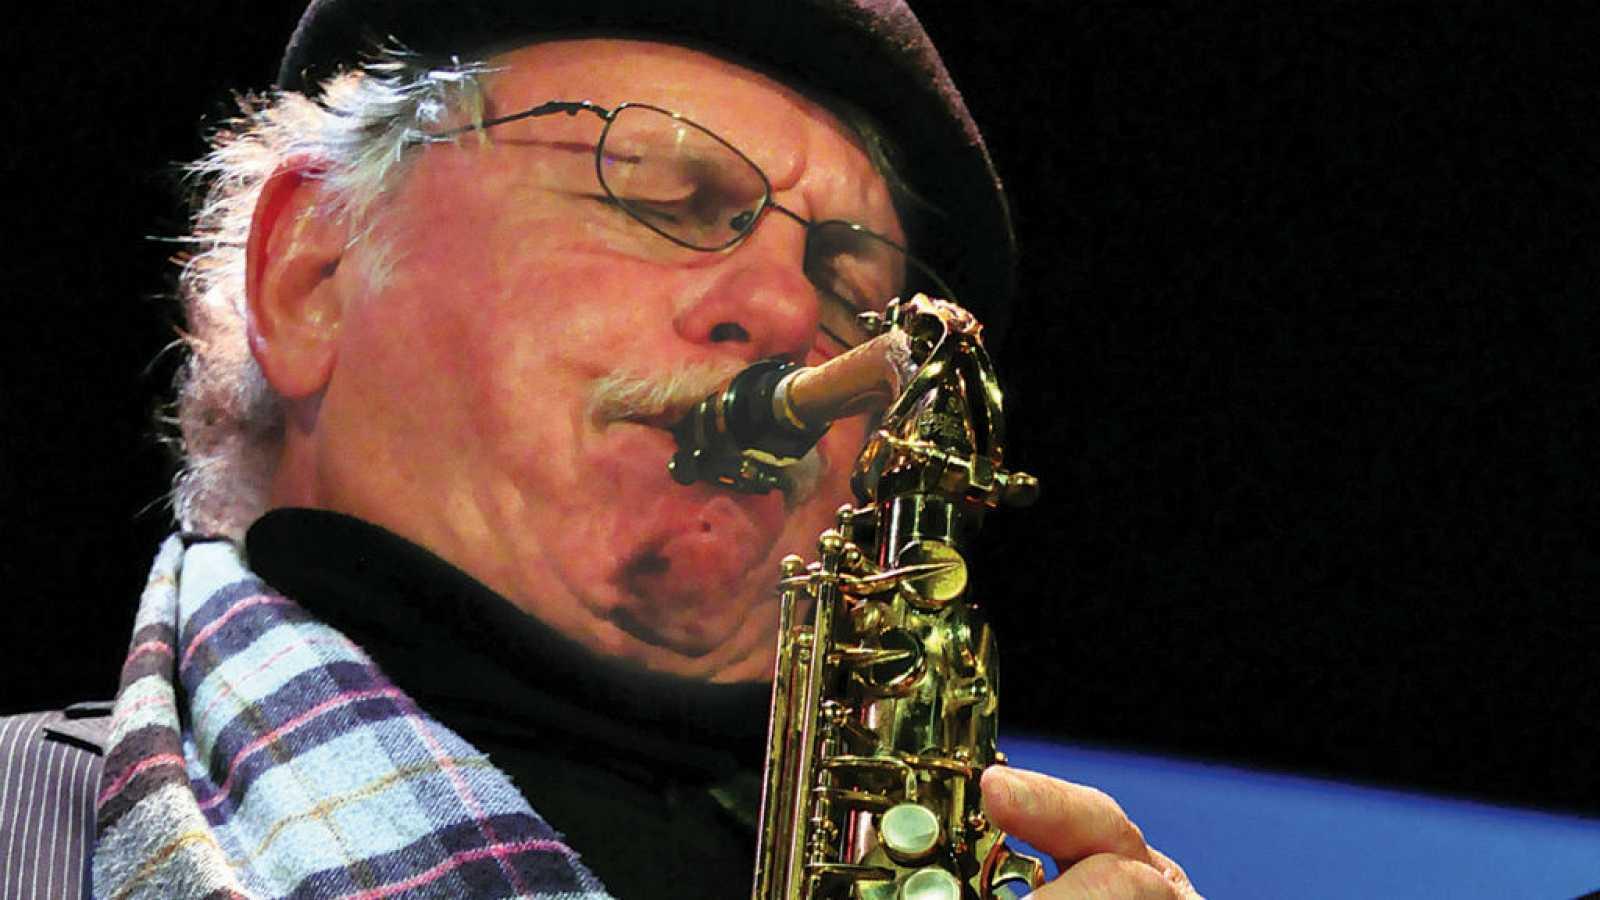 Fallece el saxofonista Richie Cole